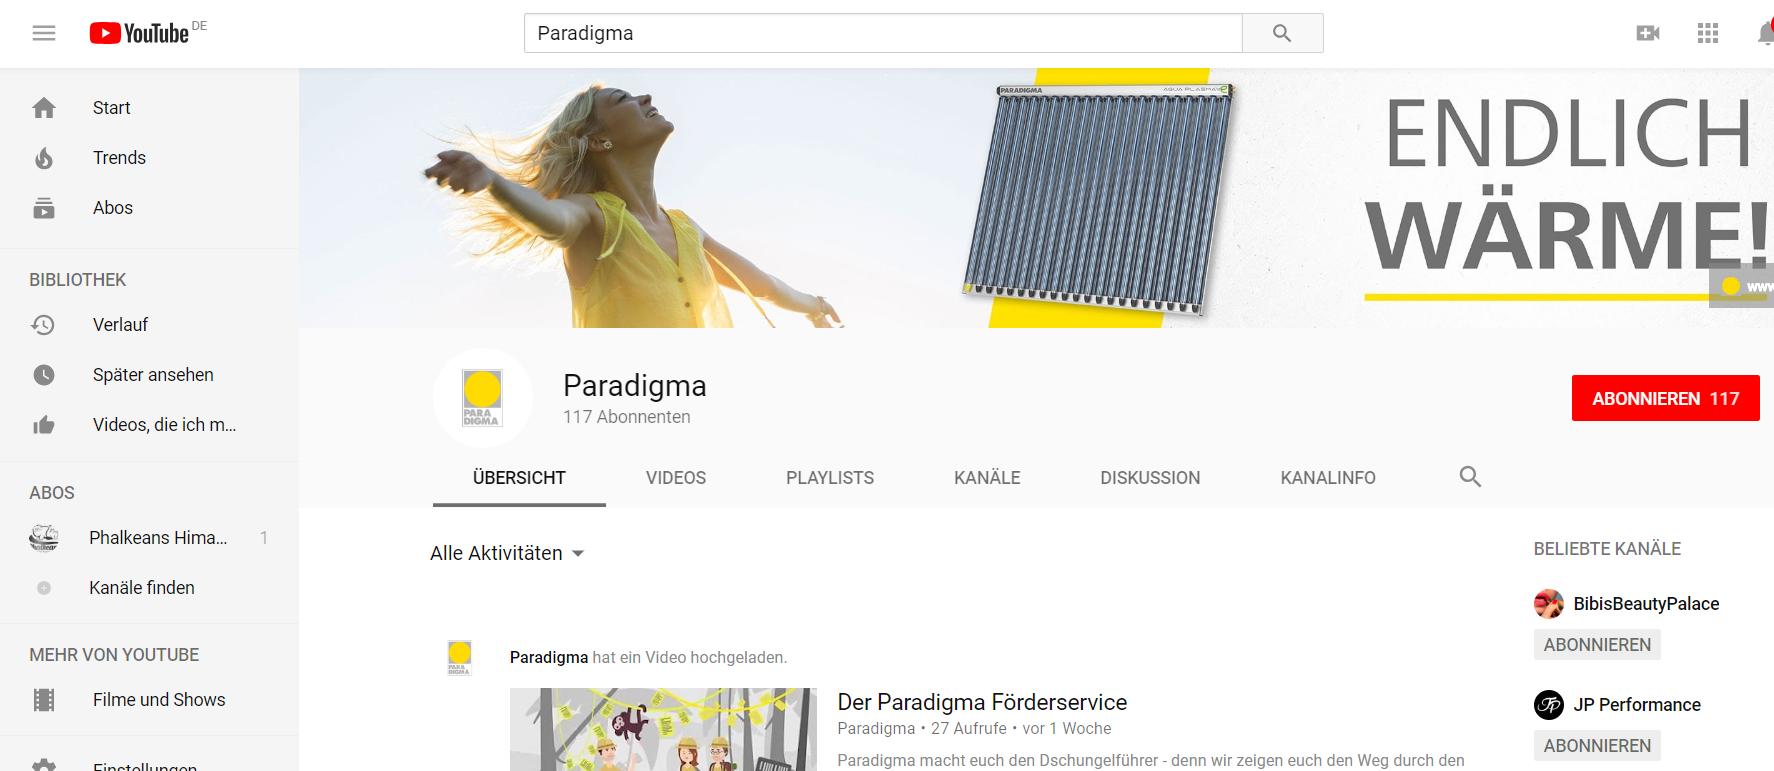 Youtube-Kanal von Paradigma_Suche auf Youtube_Paradigma_Kanal_Start